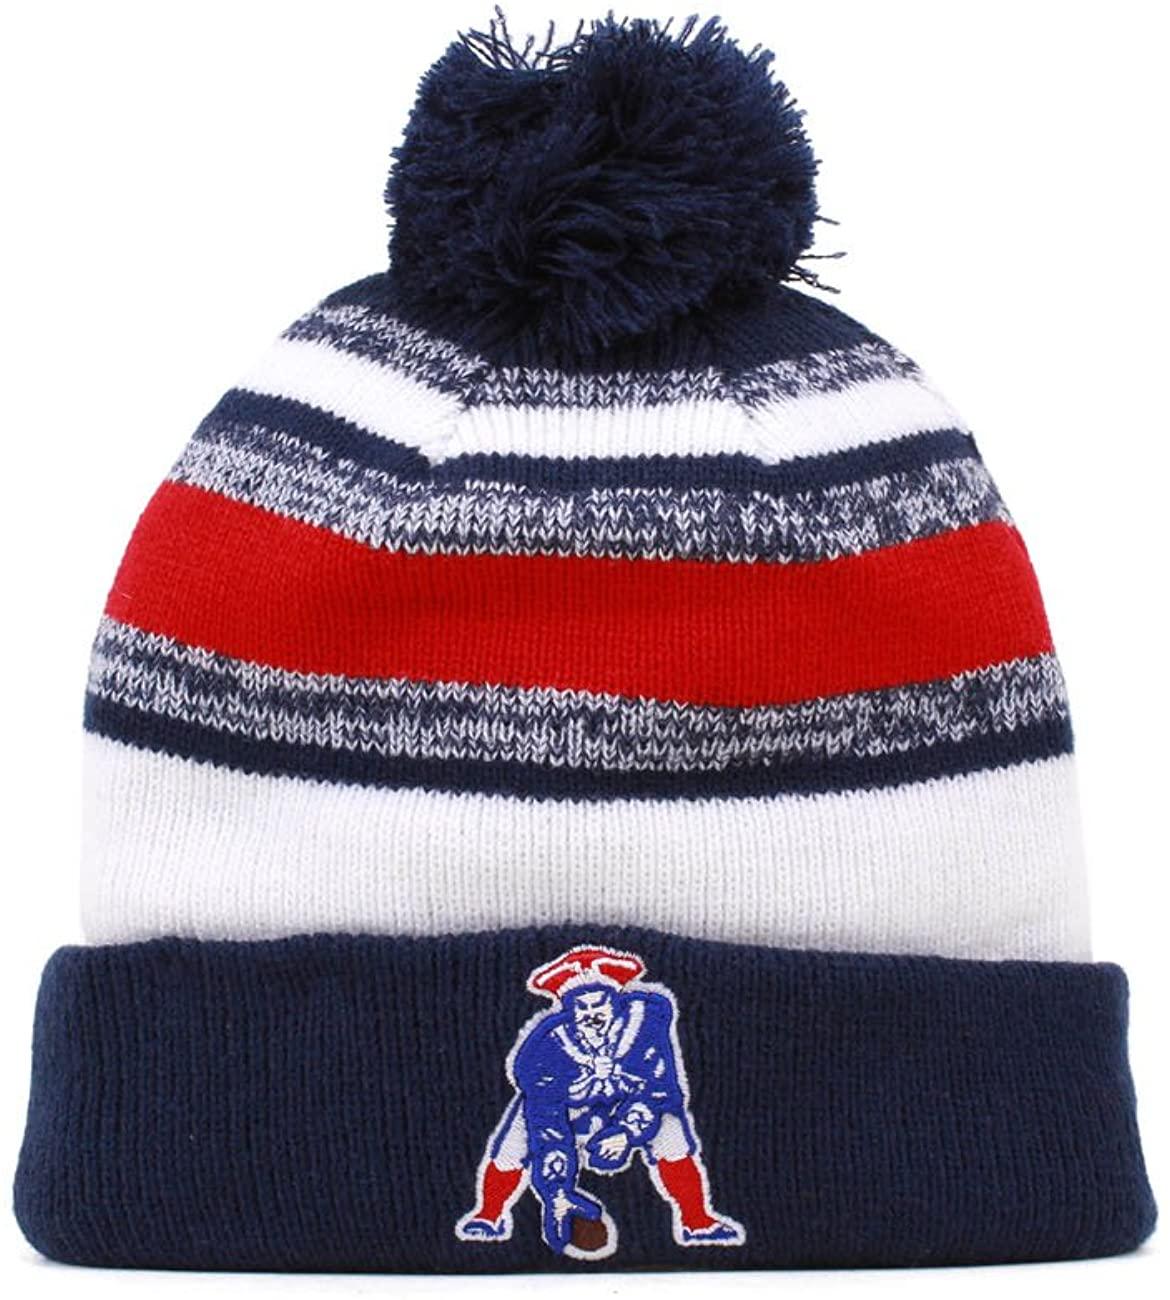 New England Patriots 2014 On Field Classic Sport Cuffed Pom Knit Beanie Hat/Cap